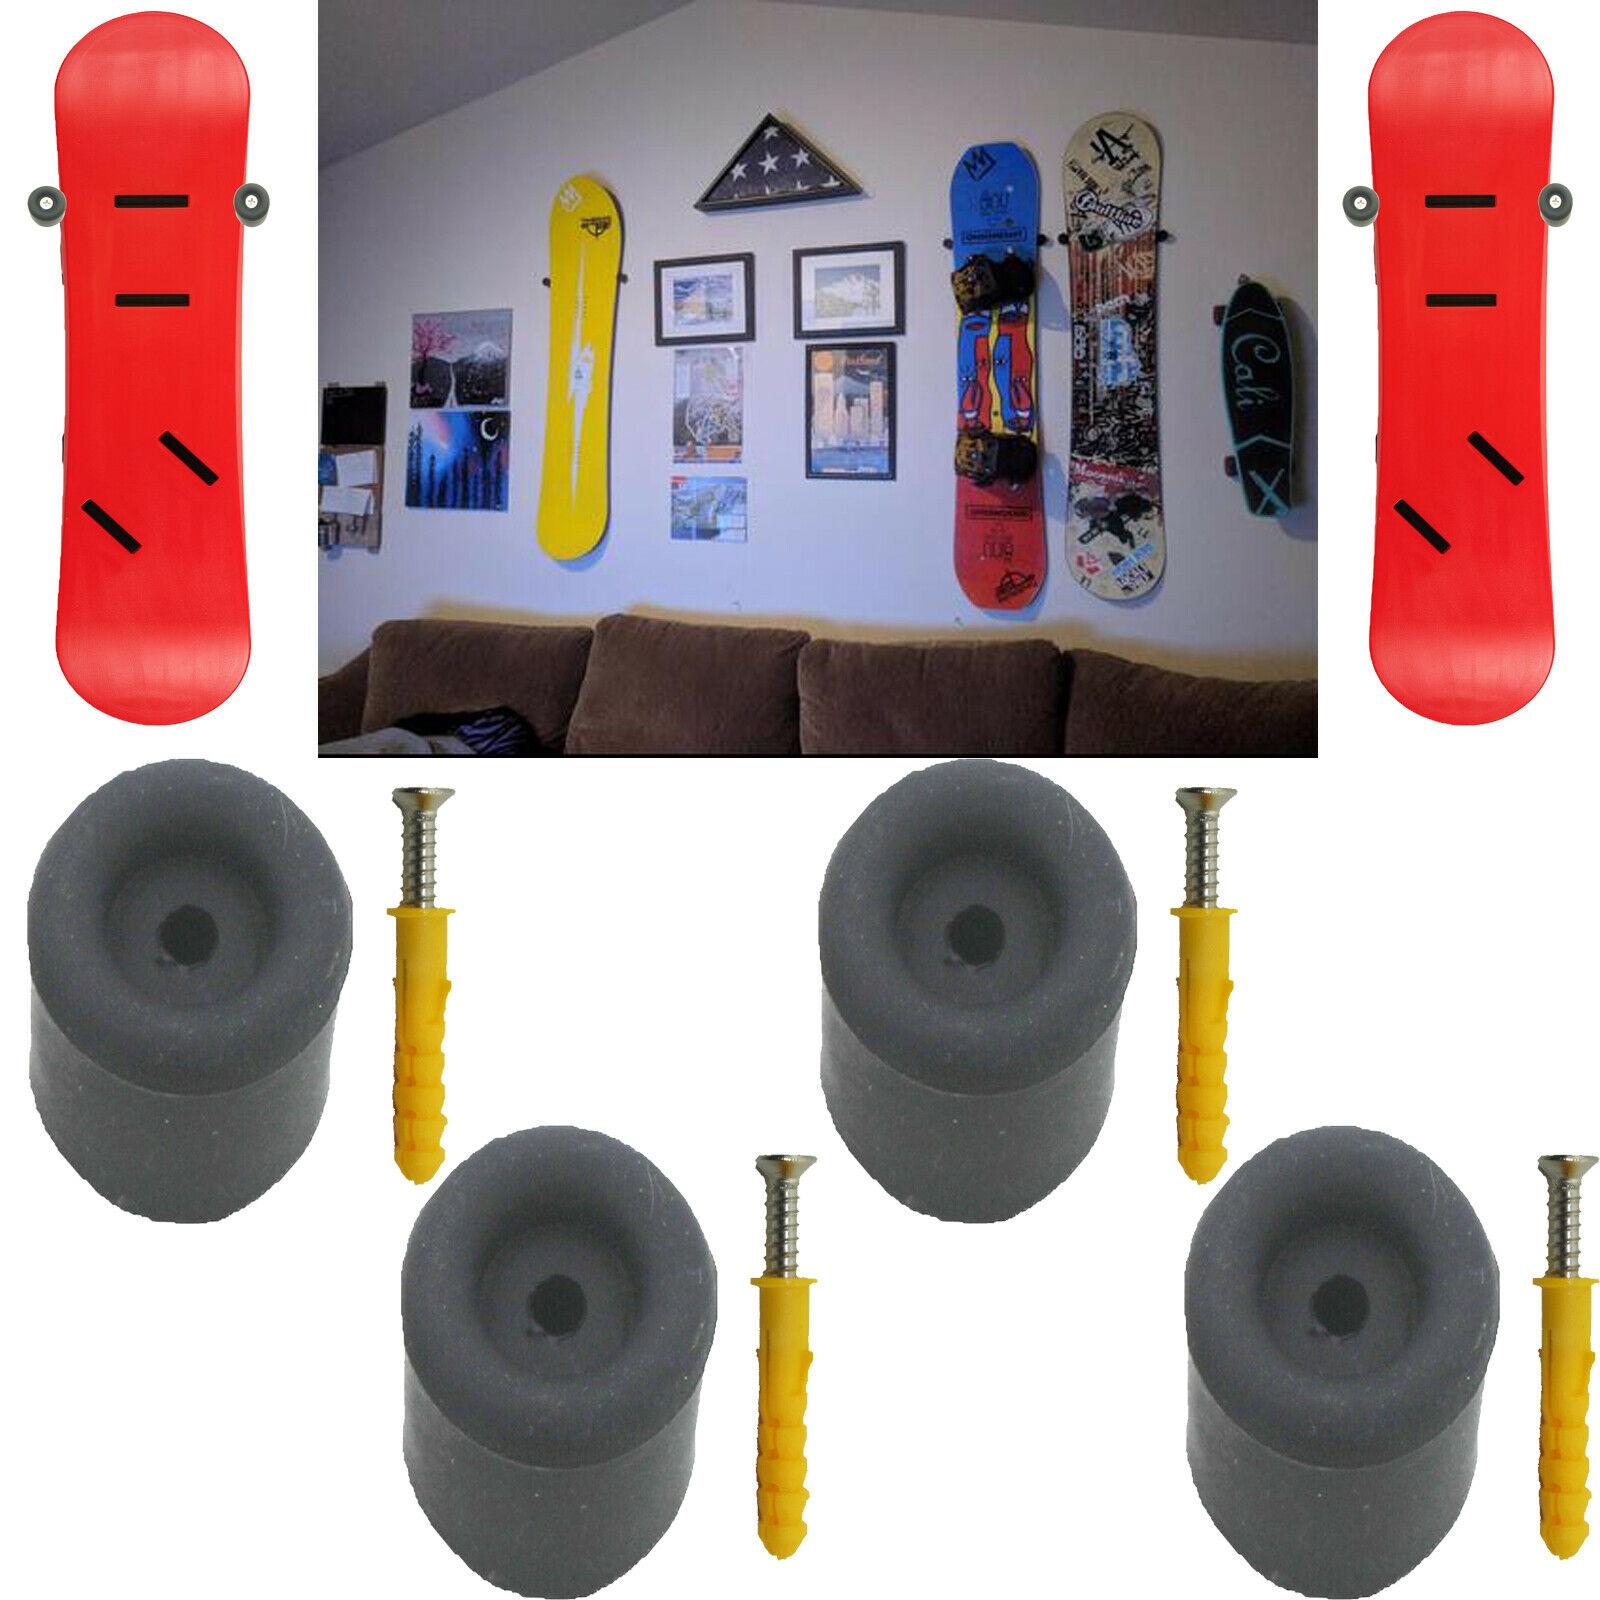 2x Black Snowboard Hanger Skateboard Holder Longboard Display Storage Wall Mount